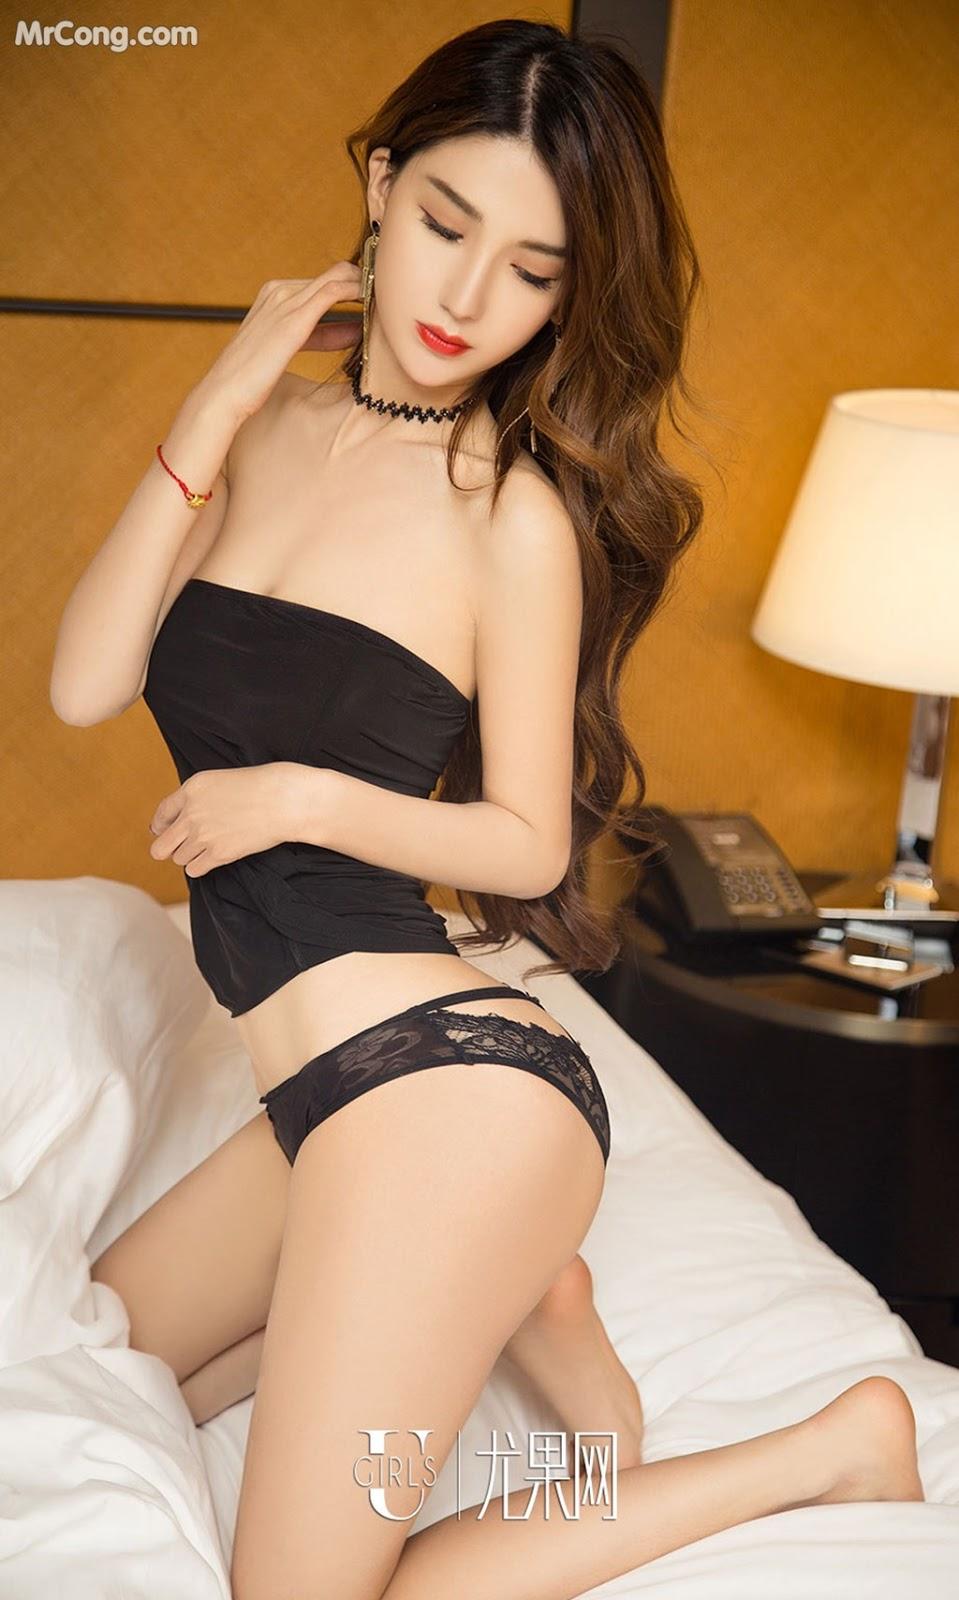 Image UGIRLS-Ai-You-Wu-App-No.1060-Li-Ya-MrCong.com-004 in post UGIRLS – Ai You Wu App No.1060: Người mẫu Li Ya (丽娅) (35 ảnh)